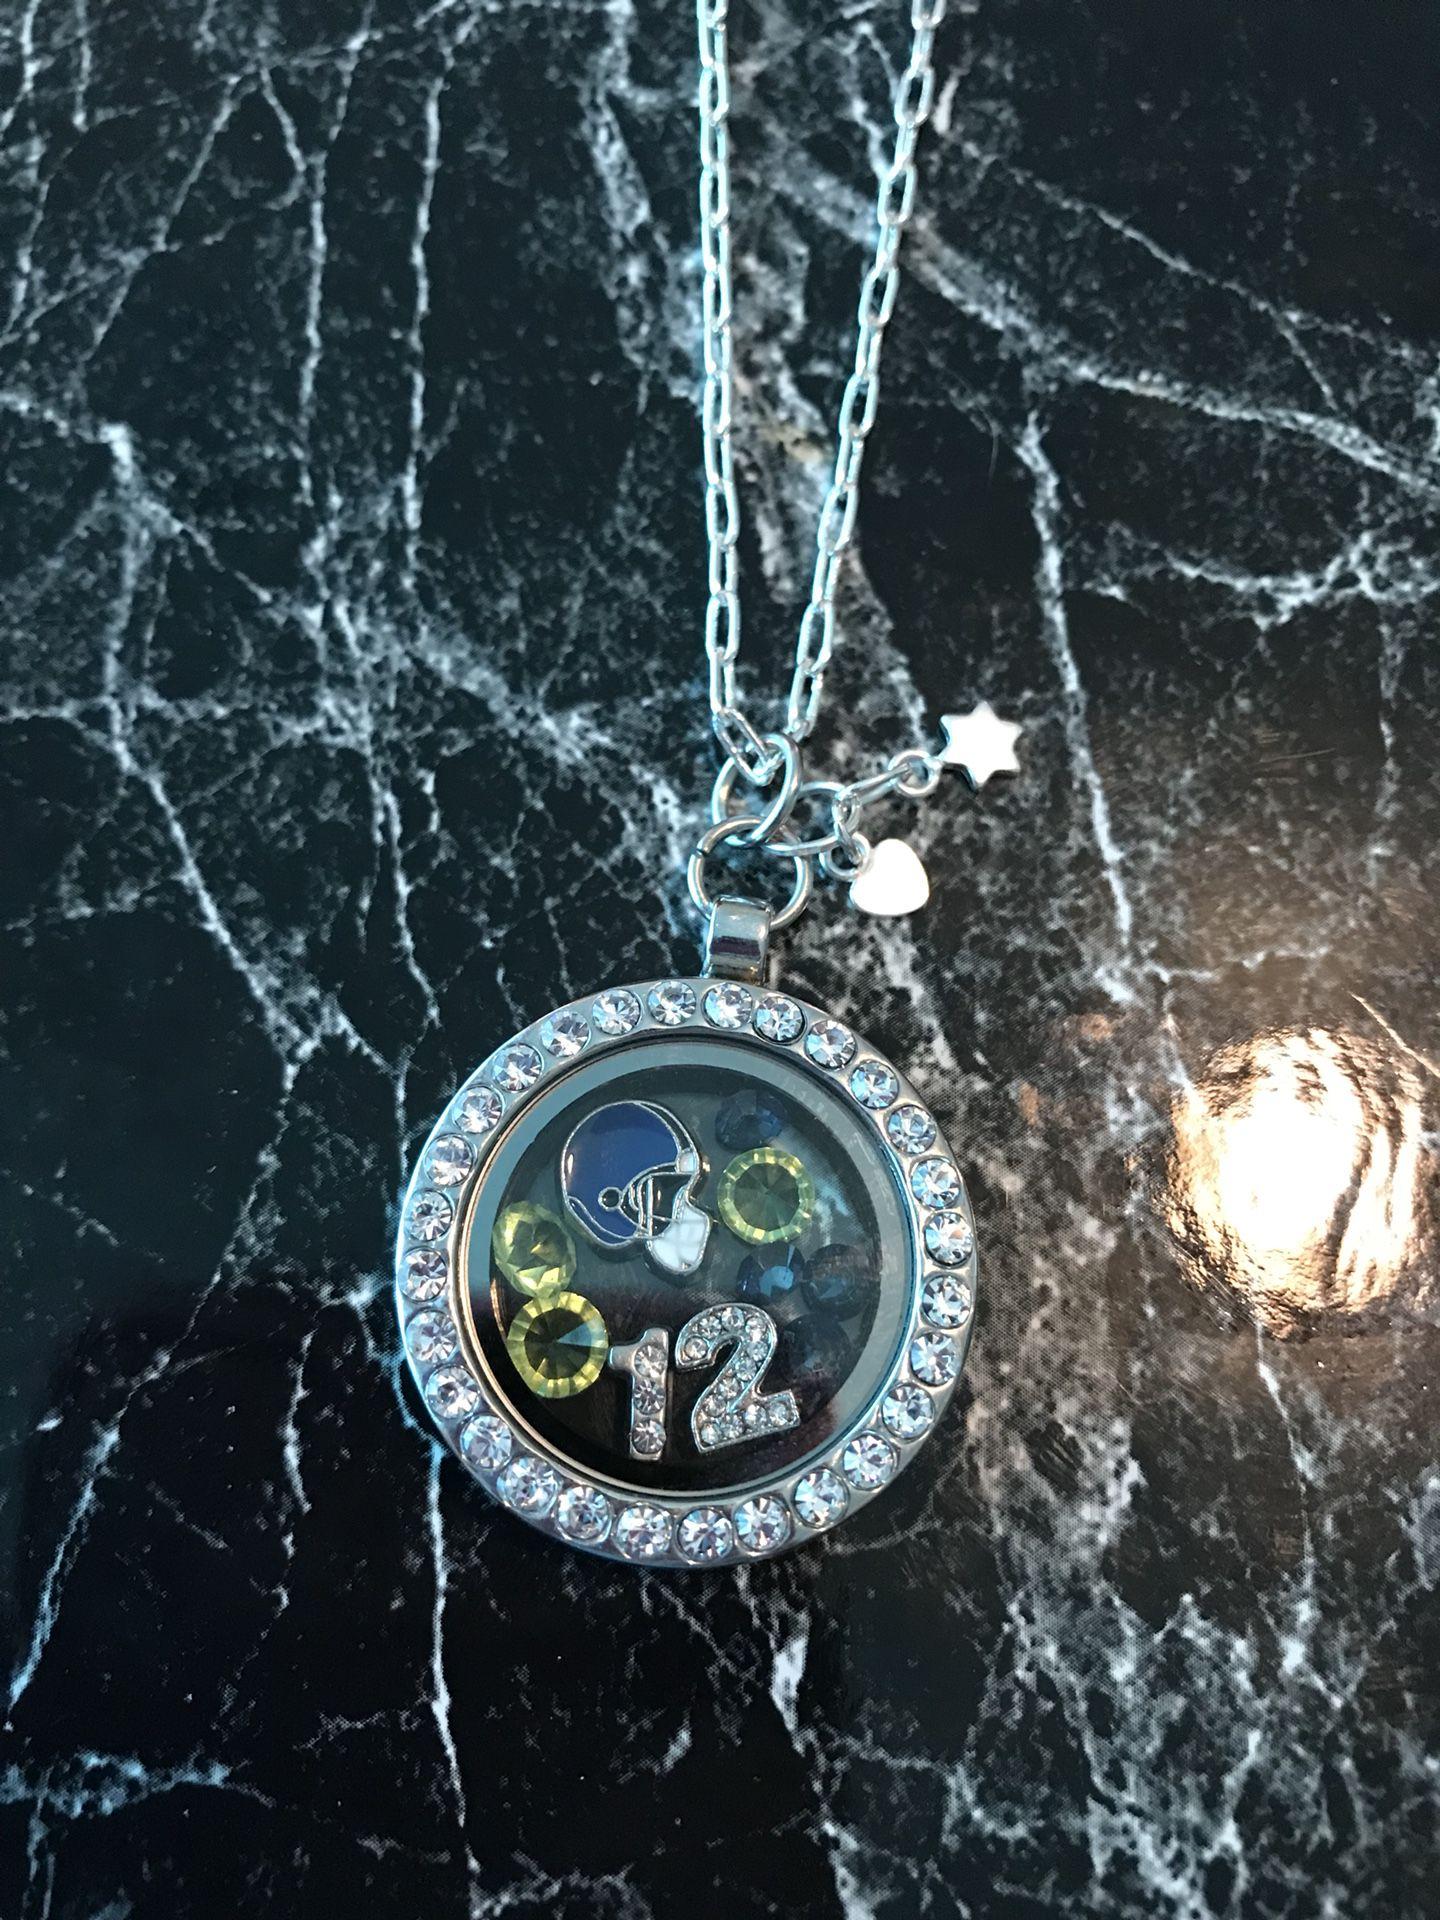 Seahawks floating charm locket necklace